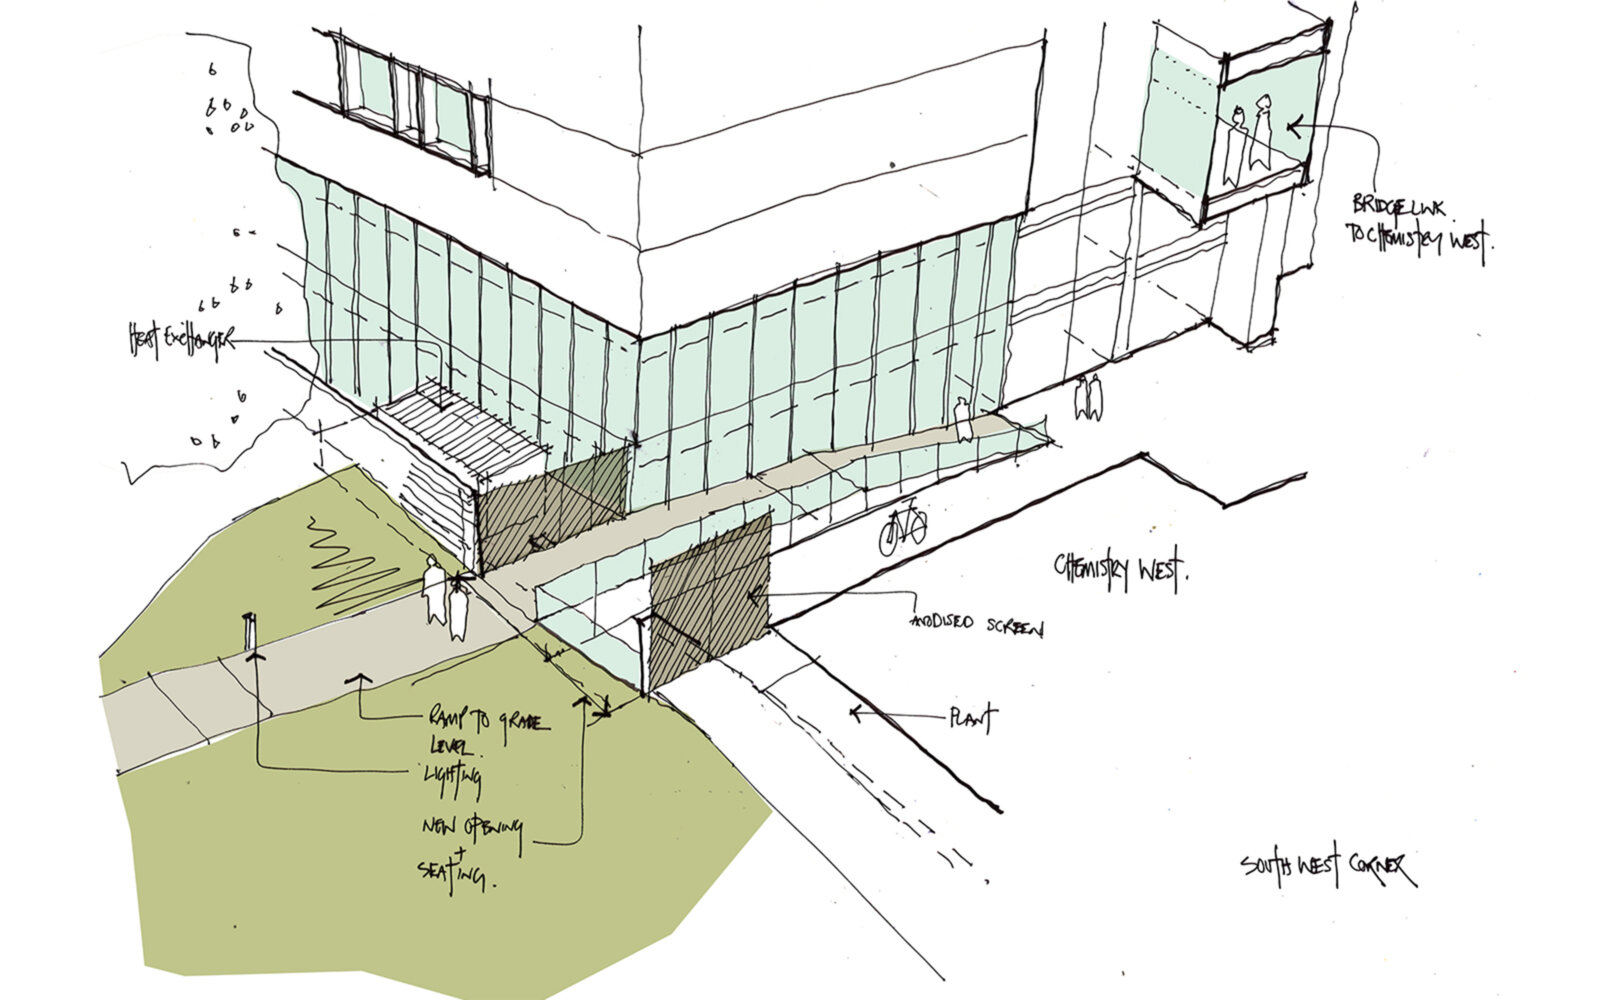 The Sir William Henry Bragg Building sketch